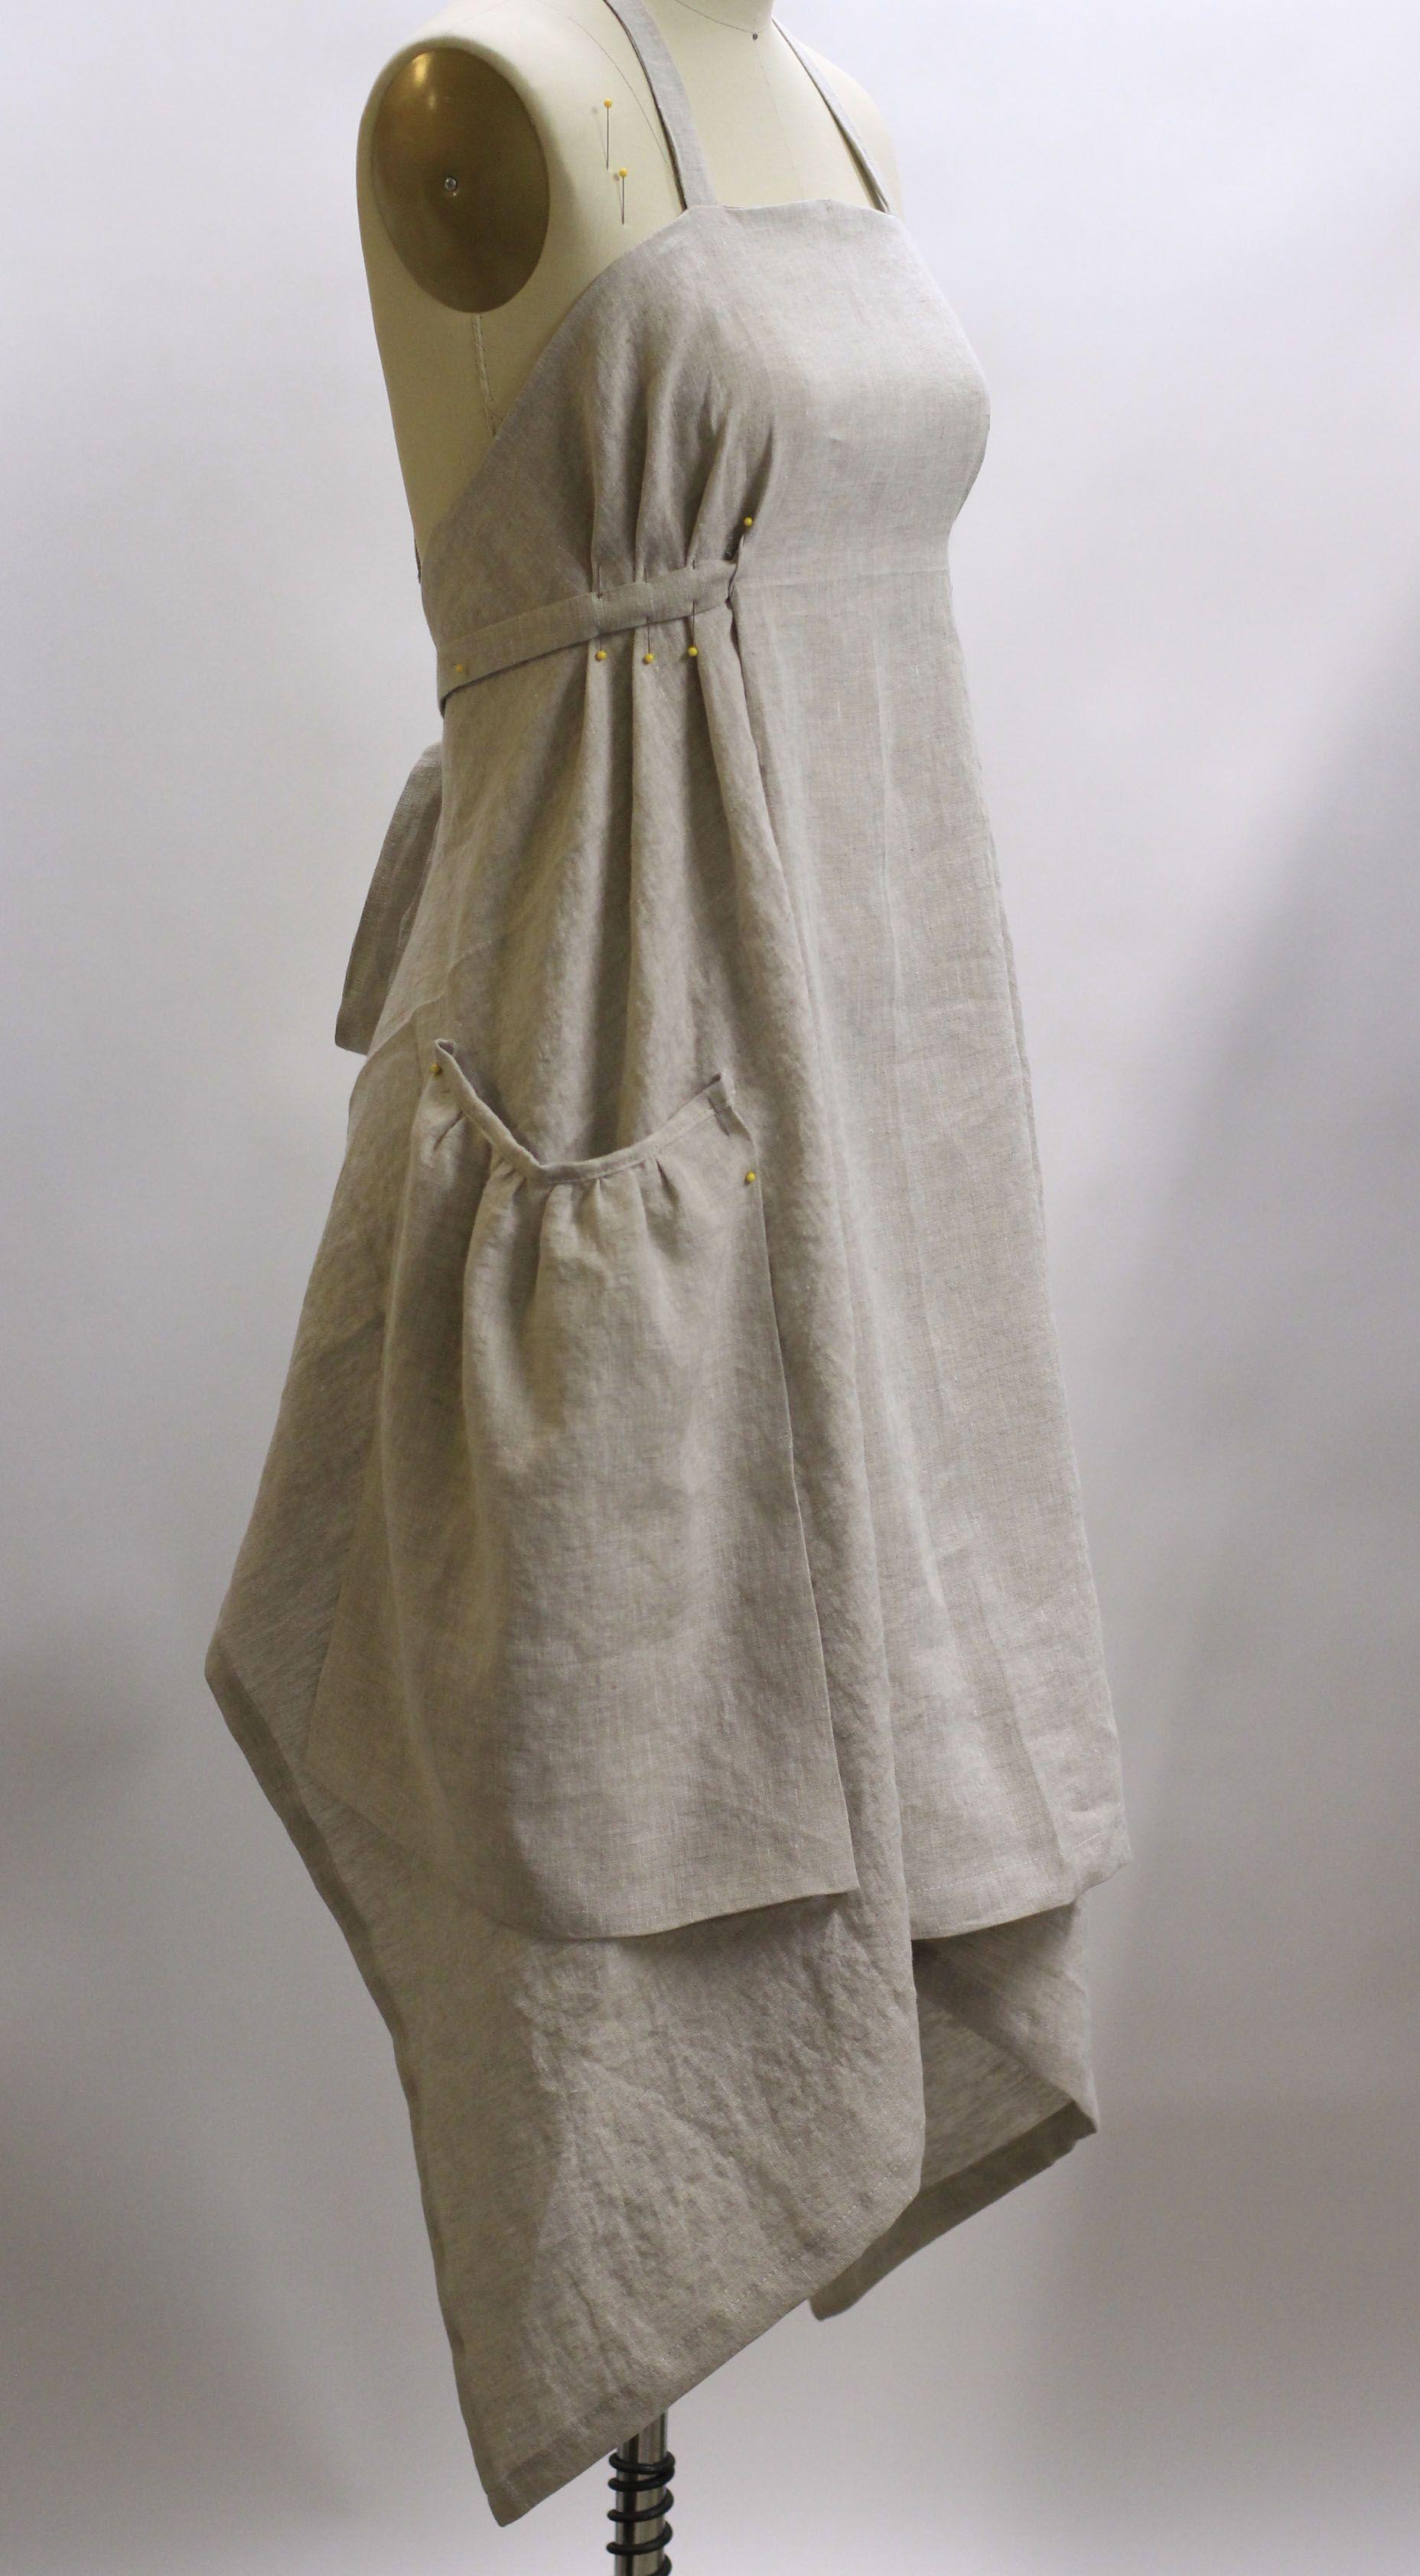 White tudor apron - Vermont Apron Company 077 Http Www Theaprongazette Com Linen